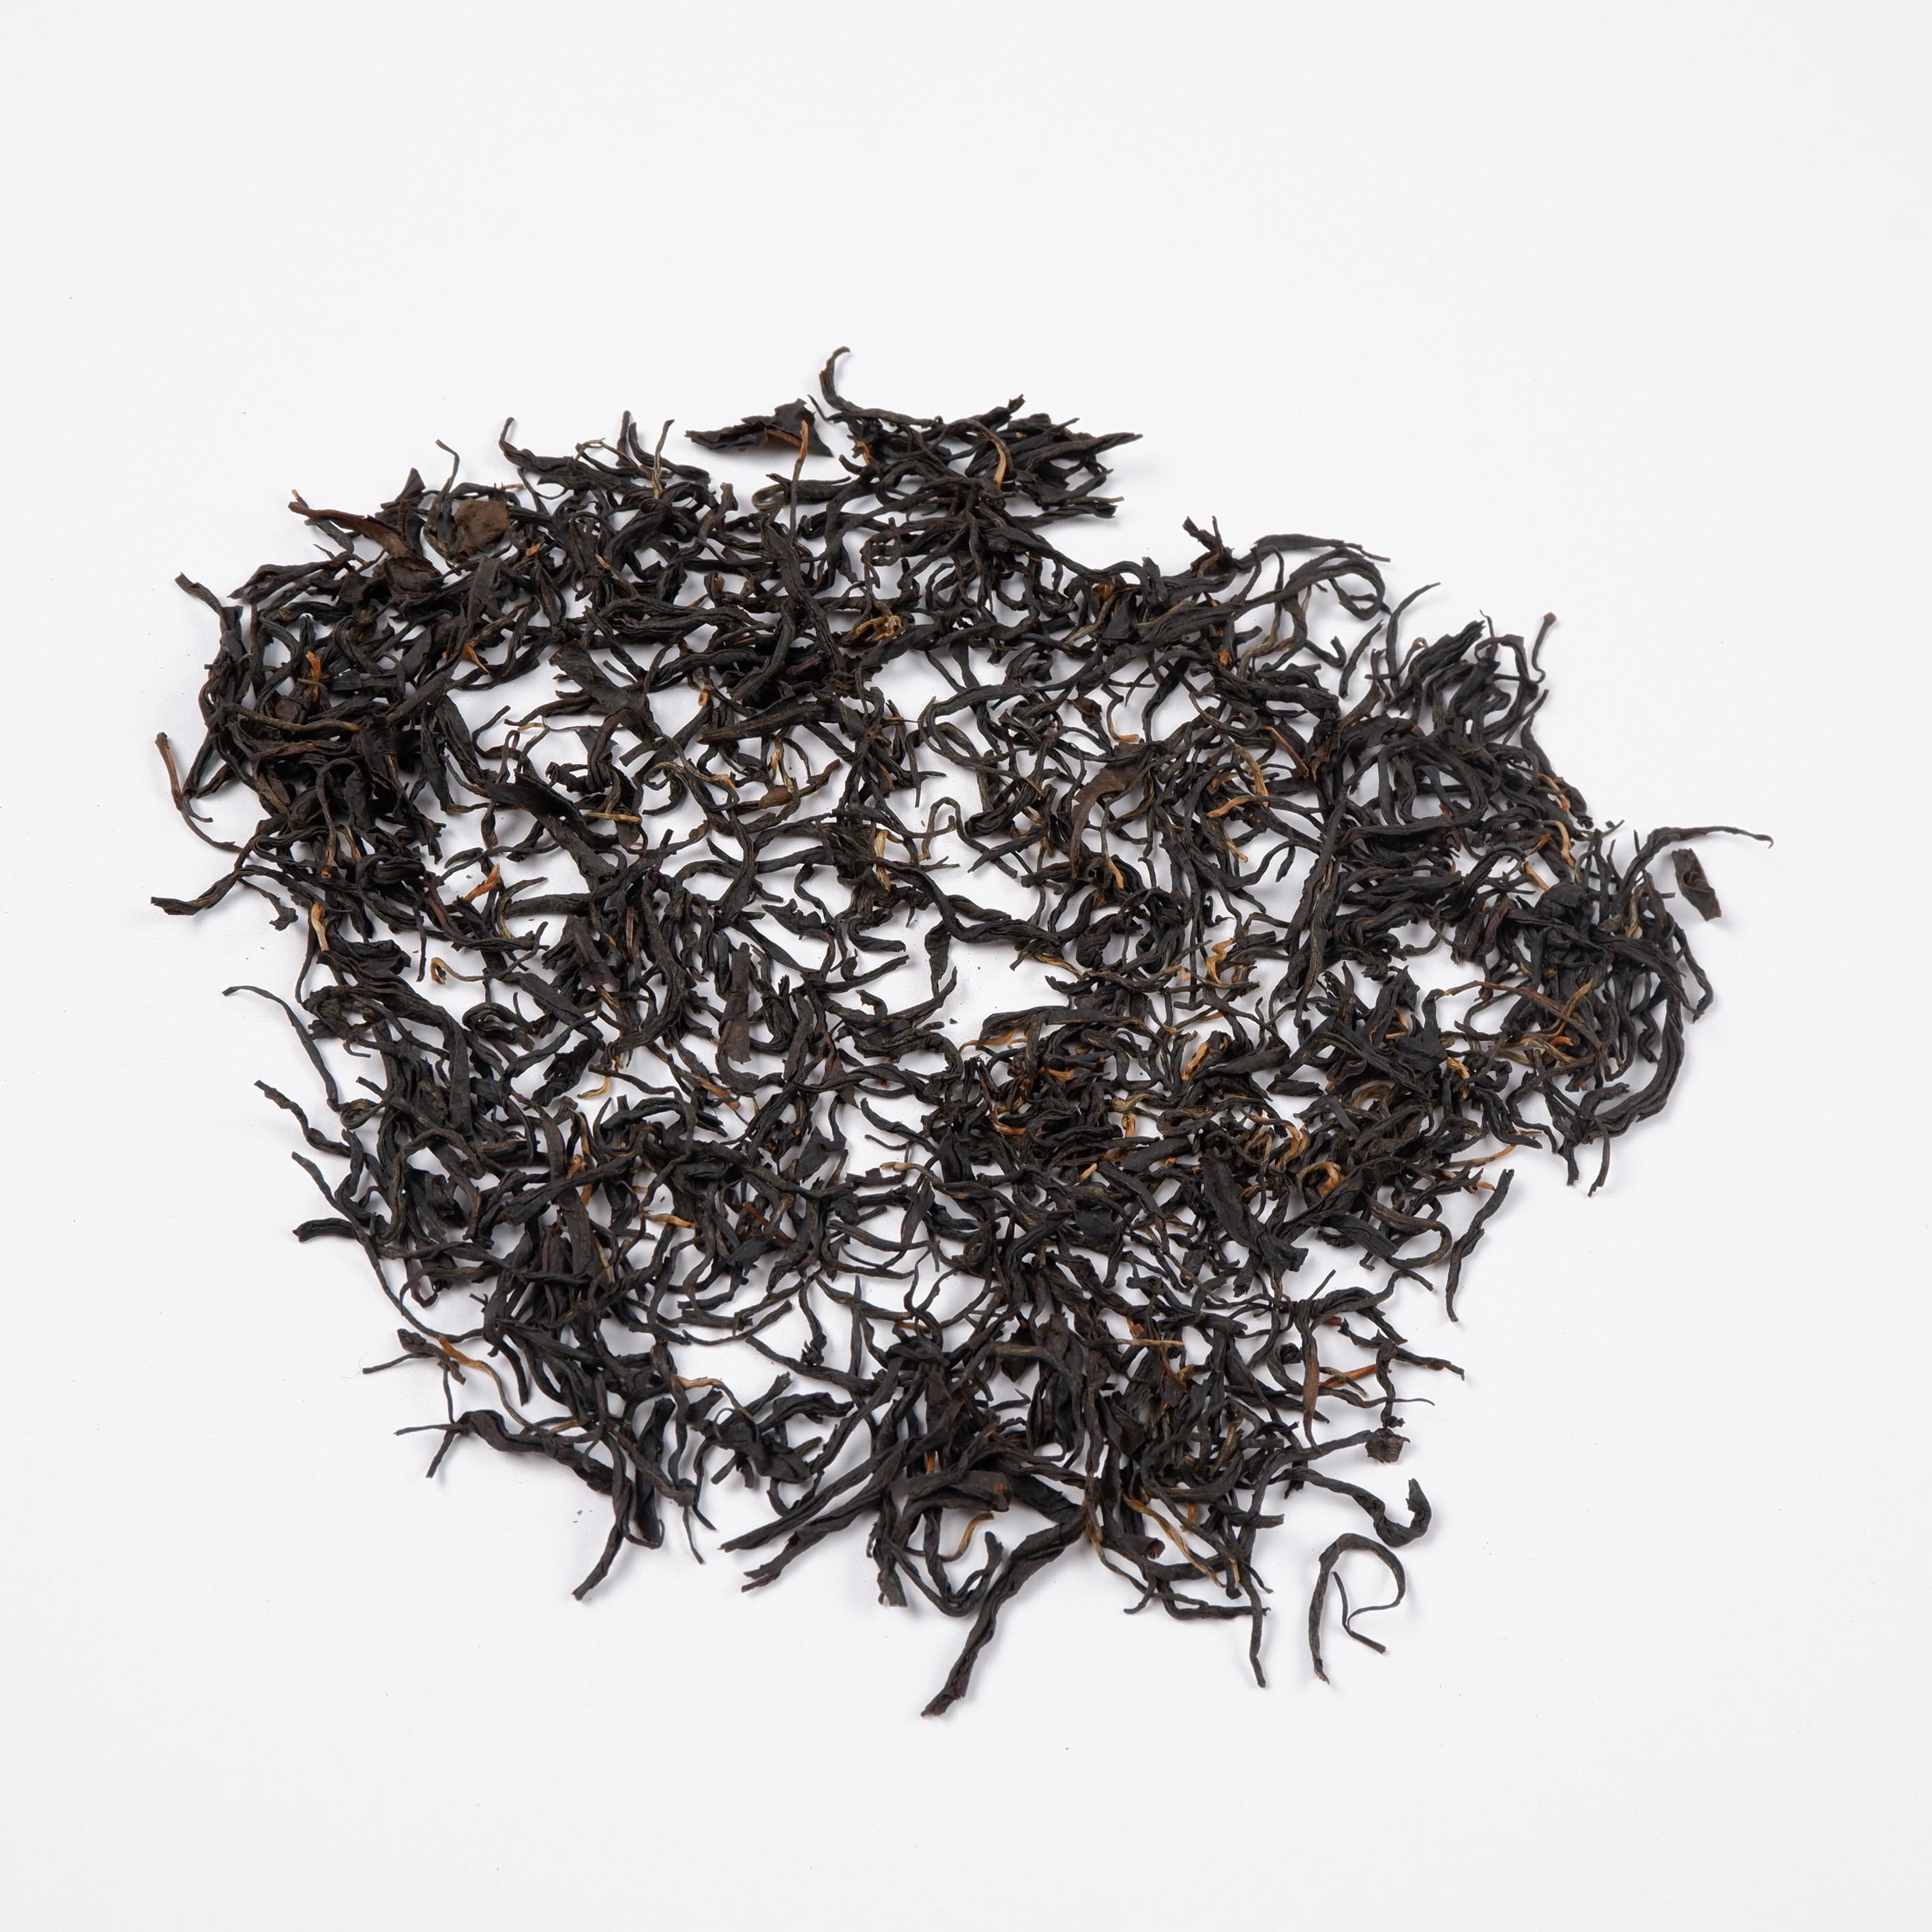 OEM Factory Supply Black Tea - 4uTea | 4uTea.com